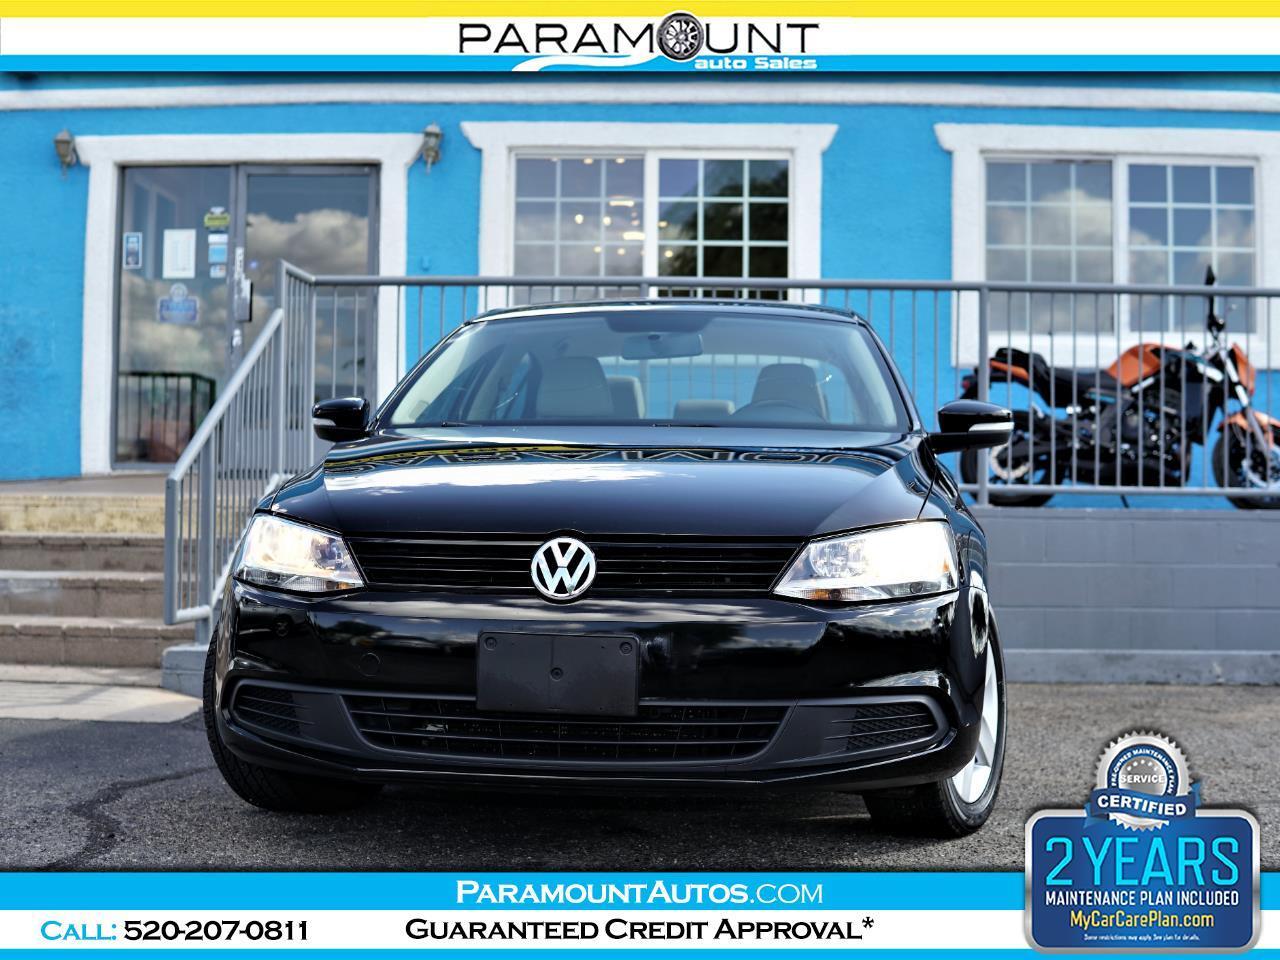 Volkswagen Jetta TDi 2012